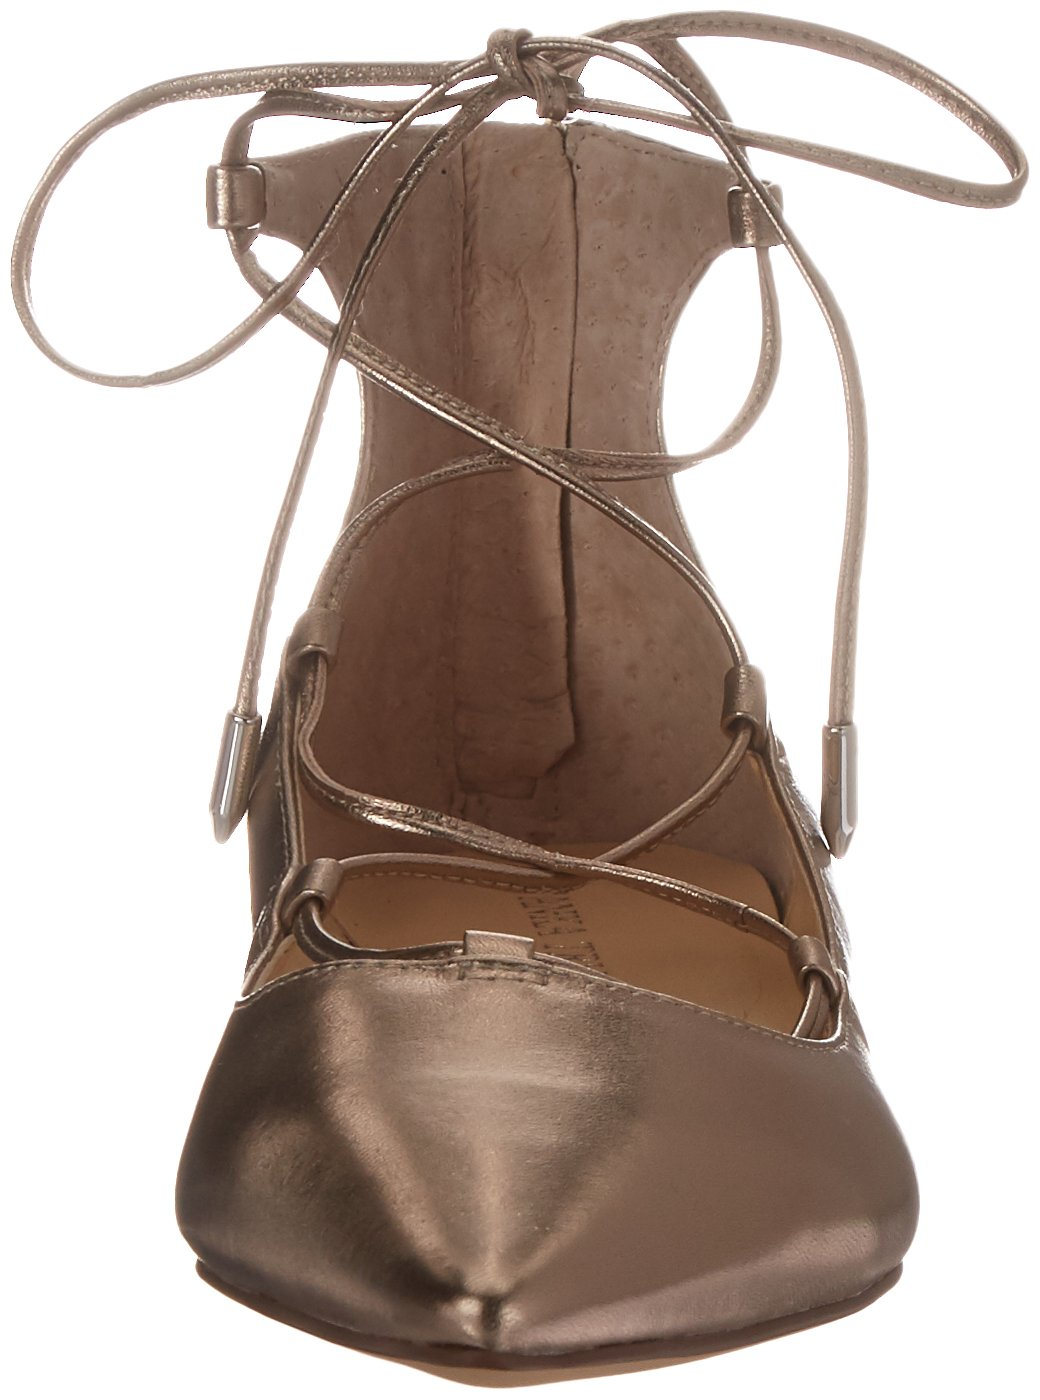 Ivanka Flat Trump Women's Tropica Ballet Flat Ivanka B01I3I08PC 7.5 B(M) US|Natural 3e5c3e